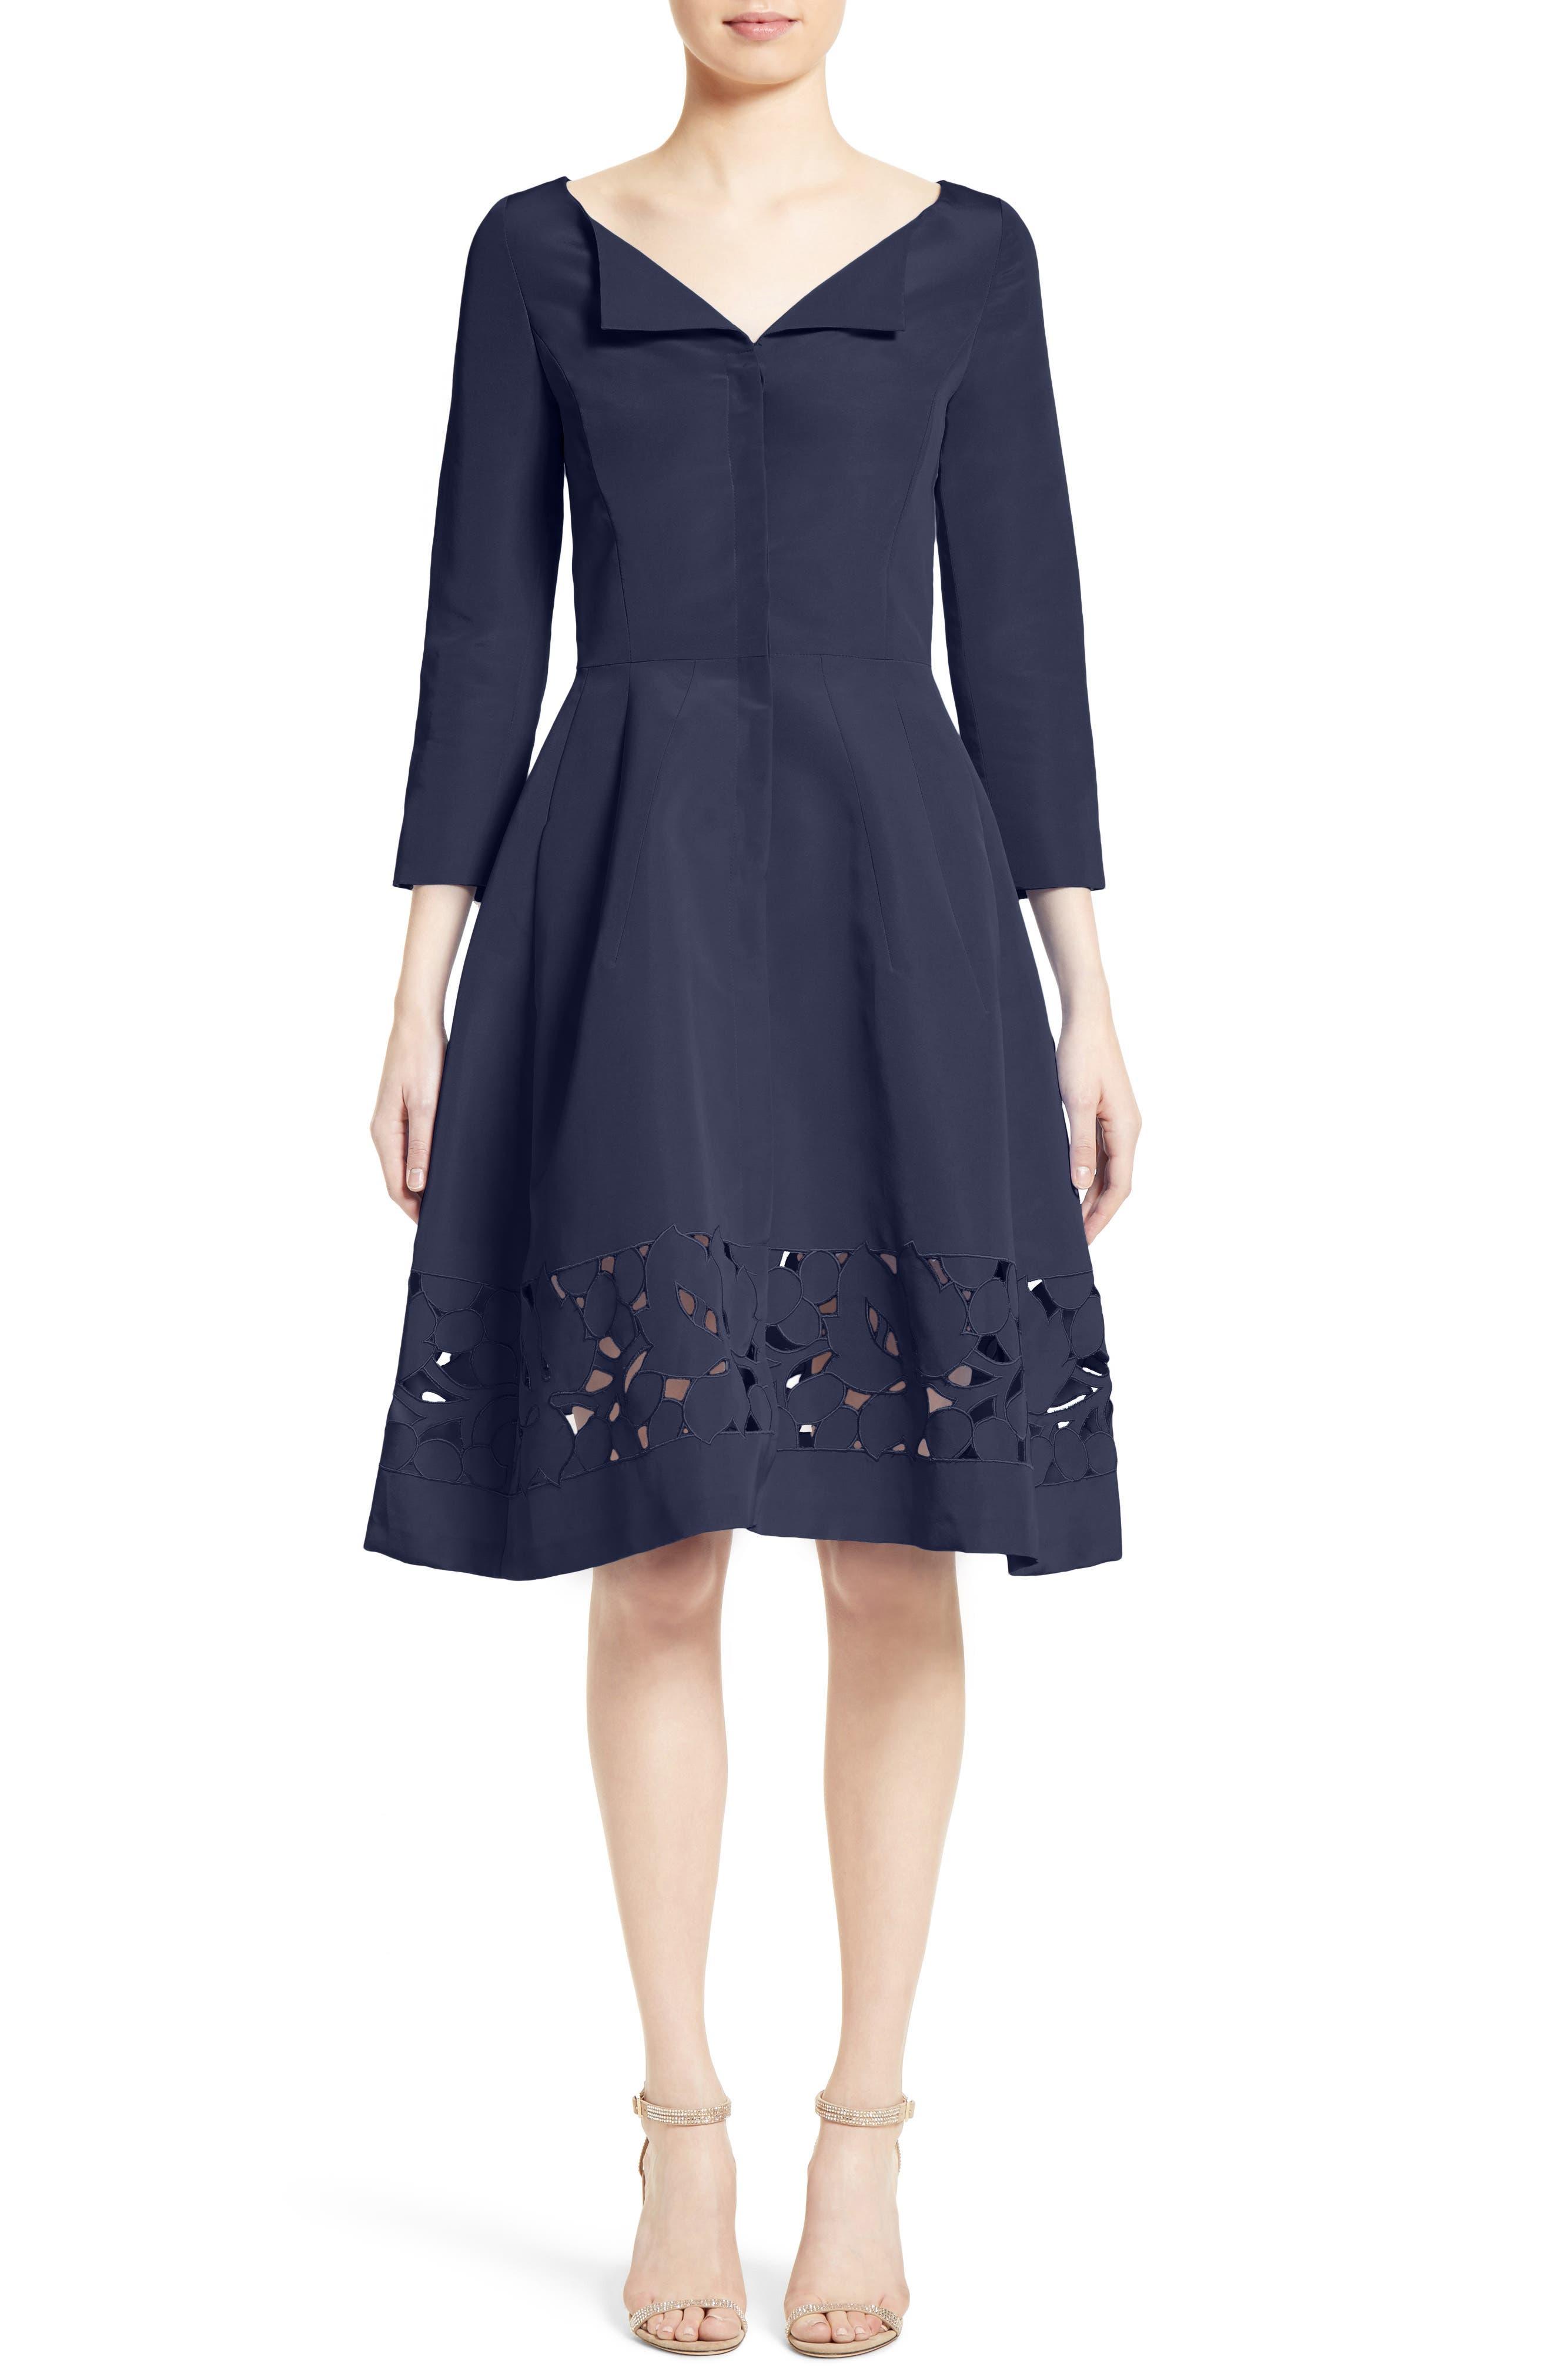 Alternate Image 1 Selected - Carolina Herrerra Laser Cut Eyelet Button Front Dress